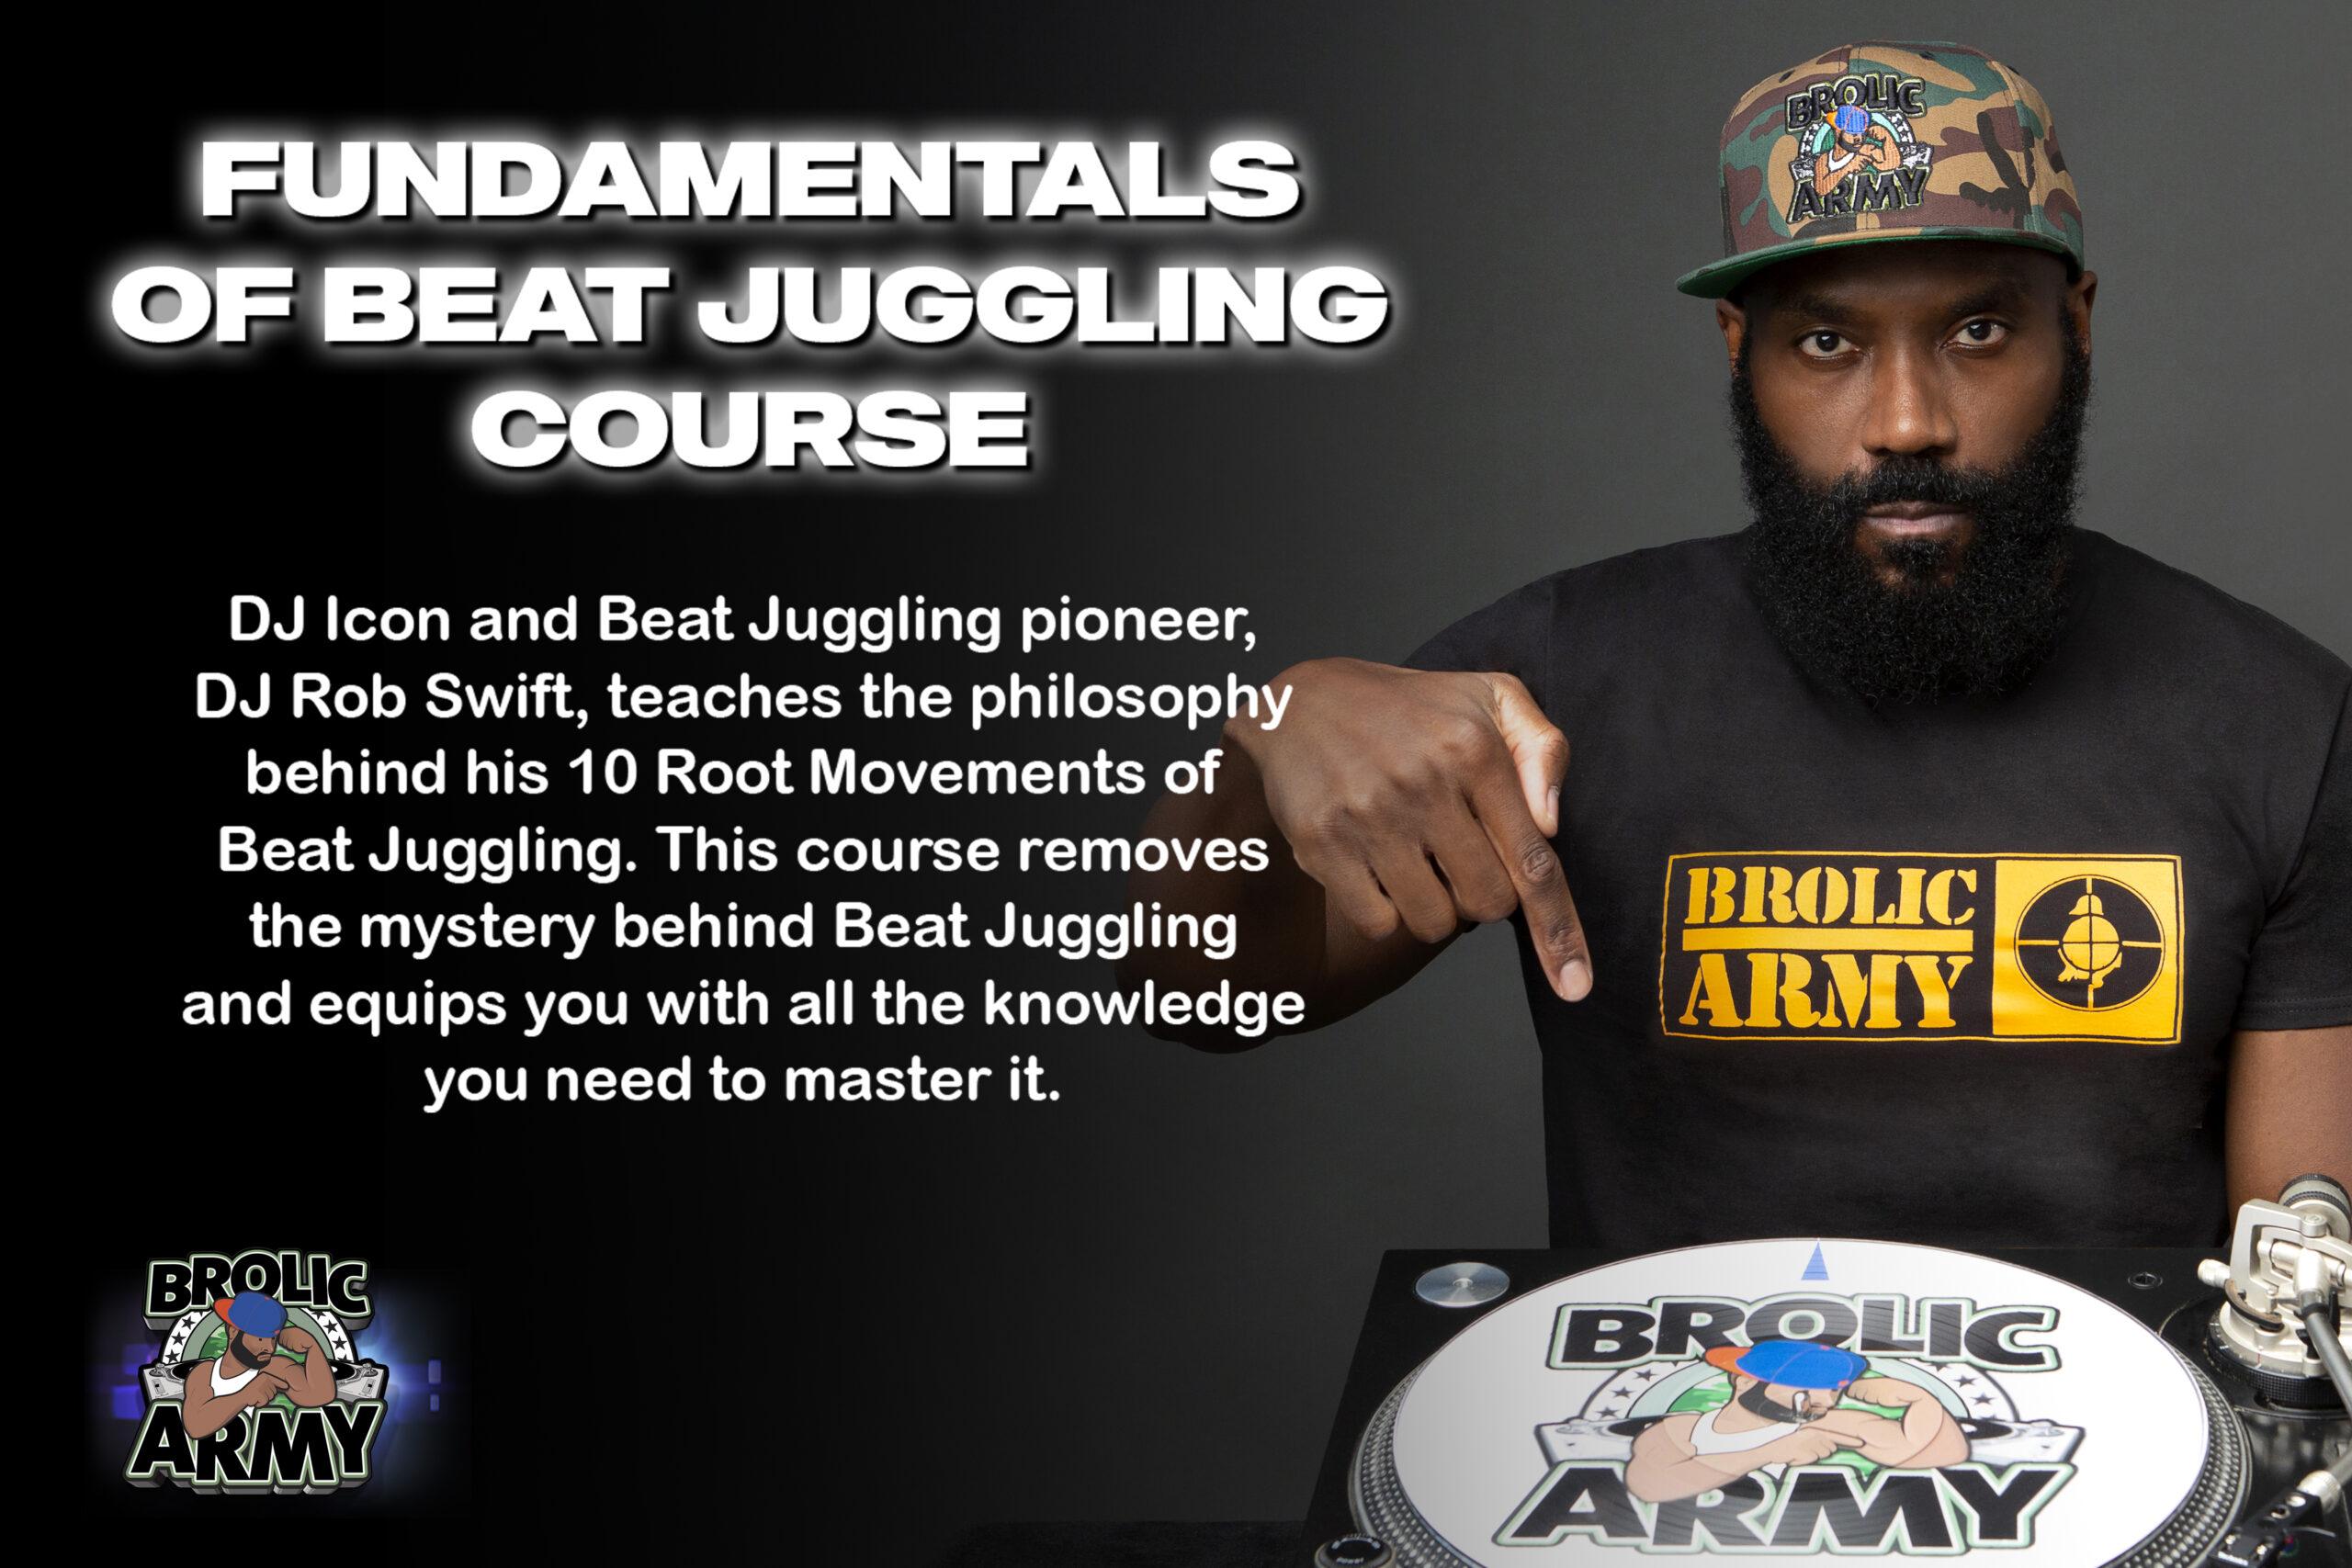 Fundamentals of Beat Juggling